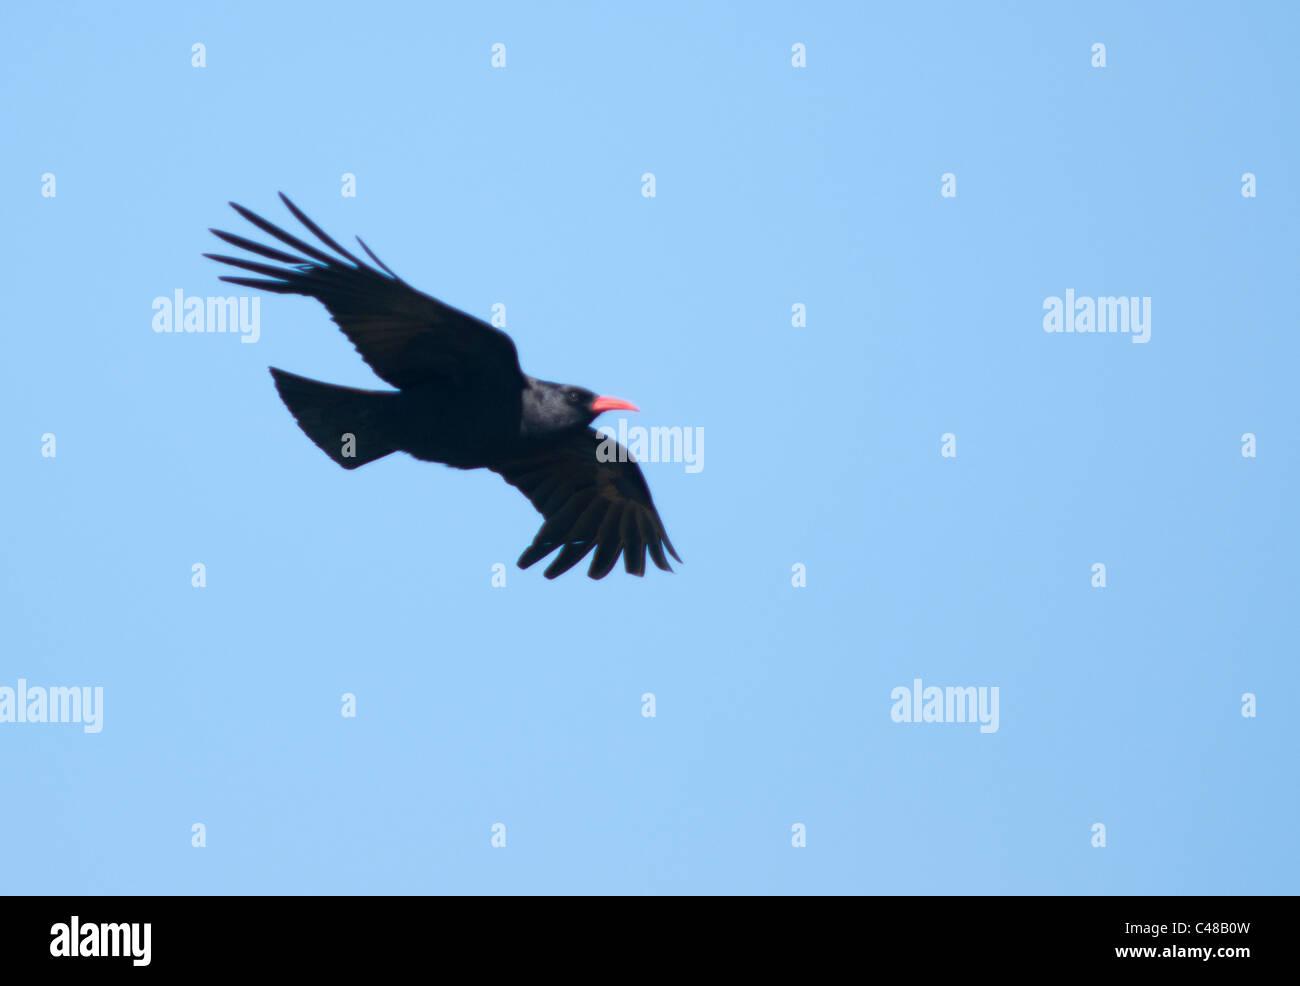 Chough (Pyrrhocorax pyrrhocorax) in flight against blue sky, Pembrokeshire, Wales - Stock Image